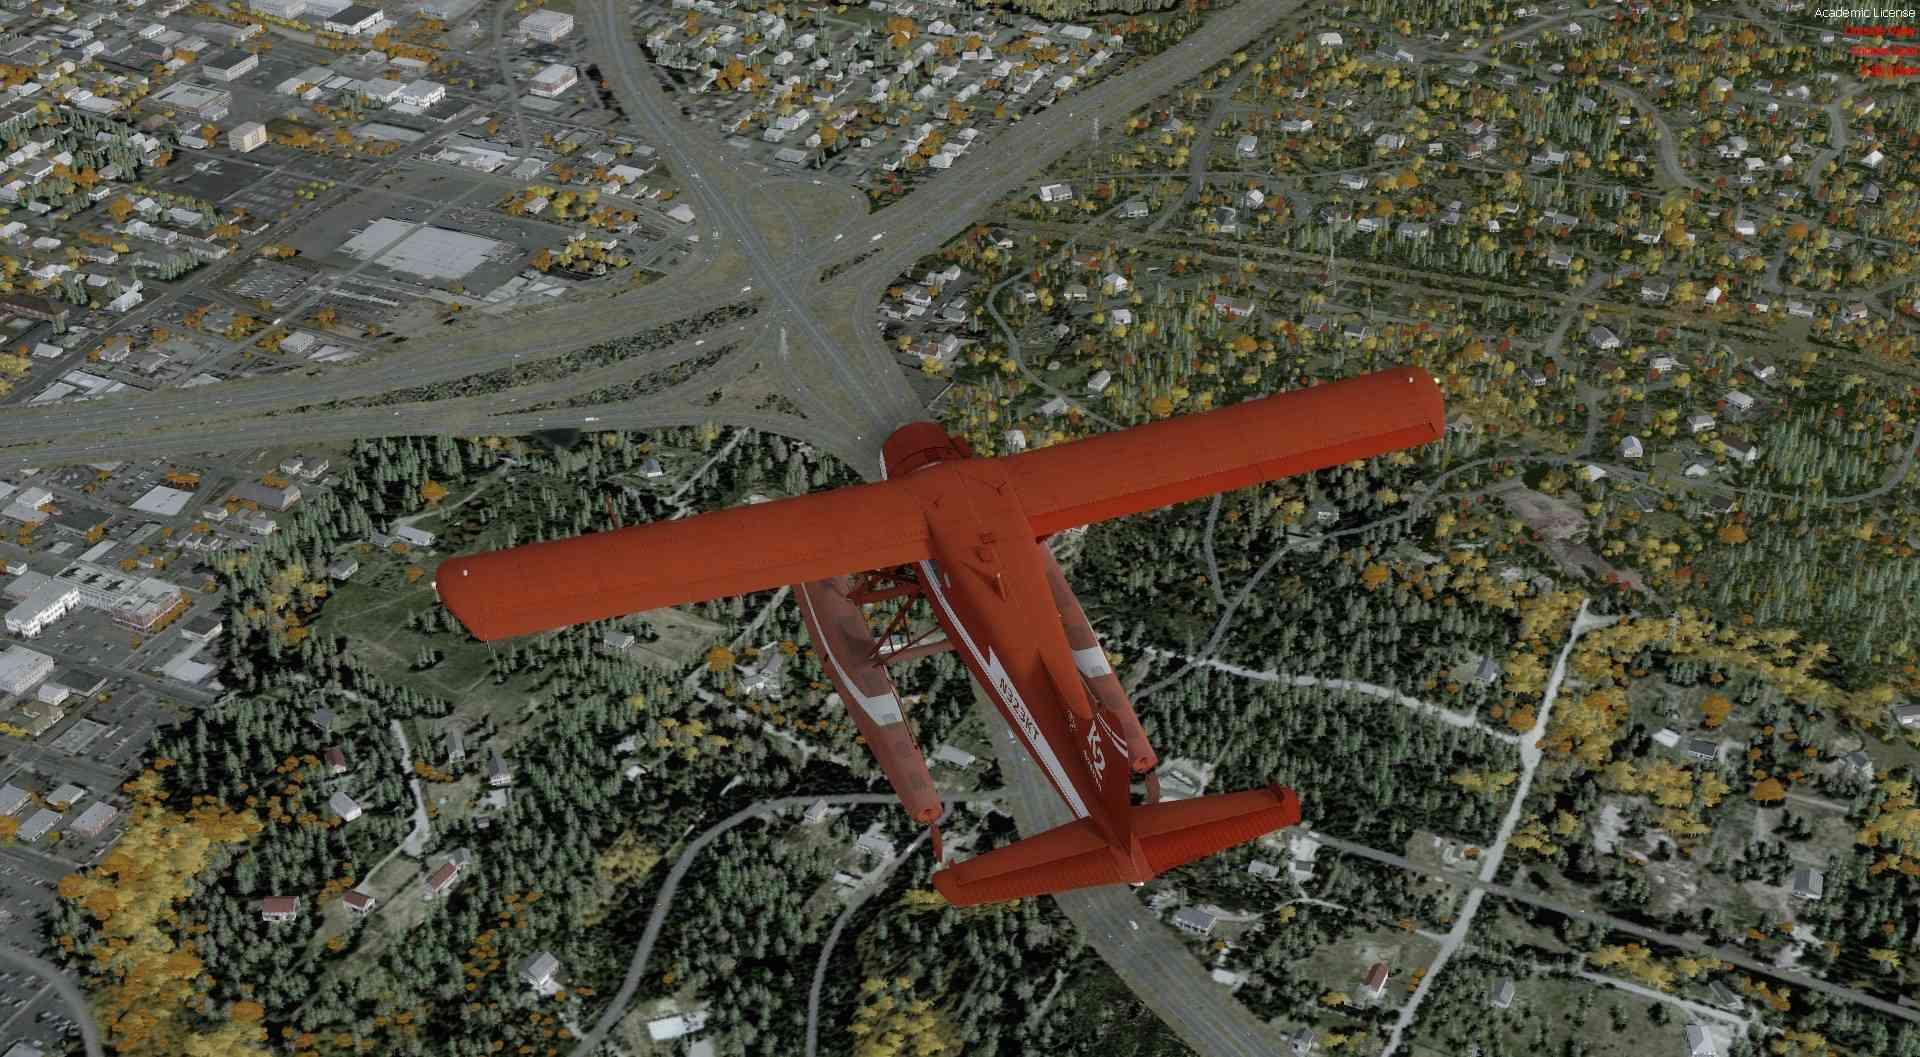 Compte rendu du vol Kenmore Air Harbor (W55) à Kenmore Air Harbor (W55) 2017-123